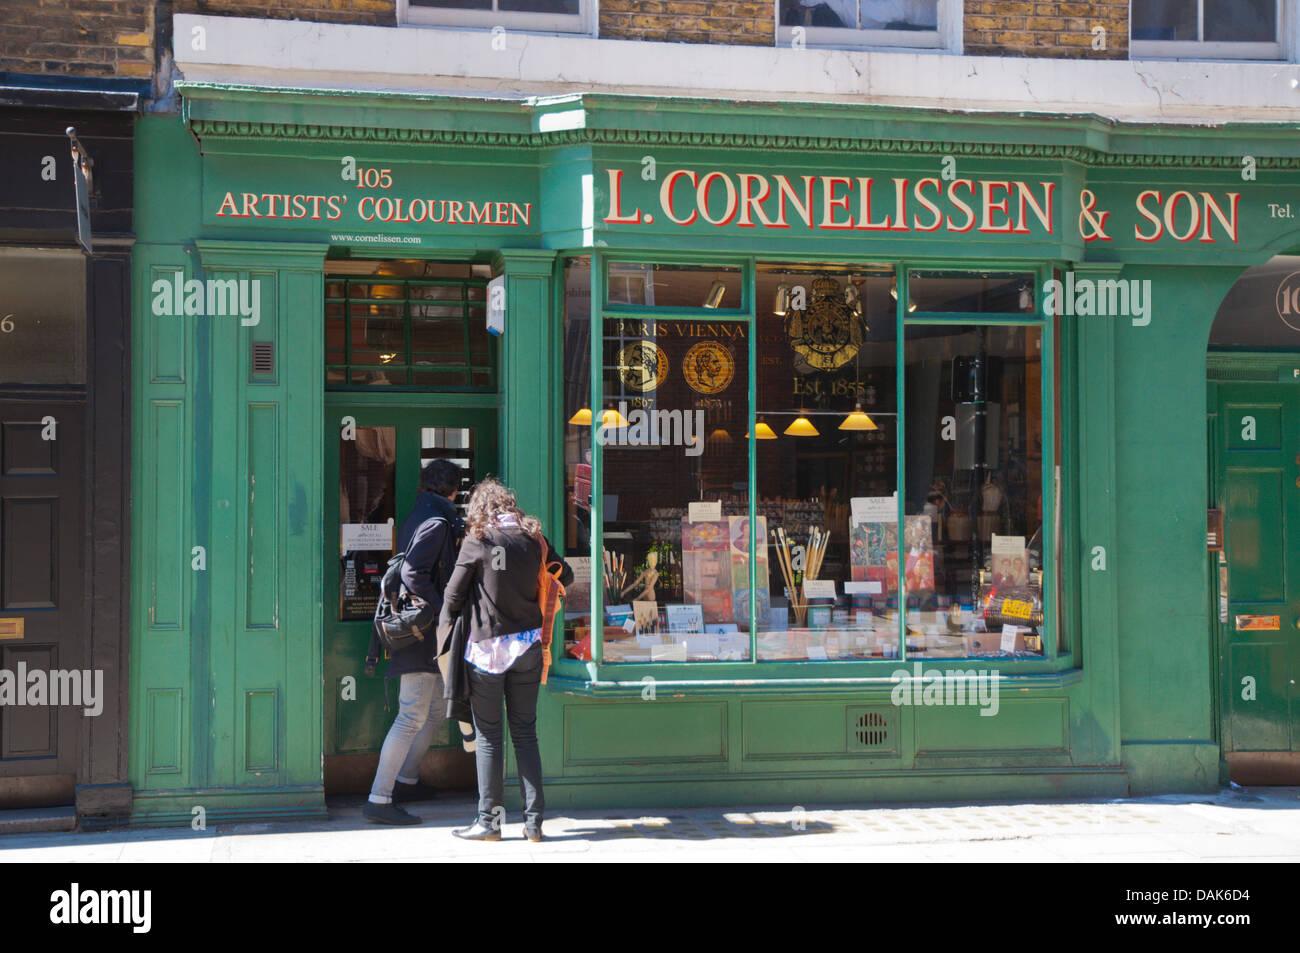 Cornelissen and Son art supply shop Bloomsbury district London England Britain UK Europe - Stock Image